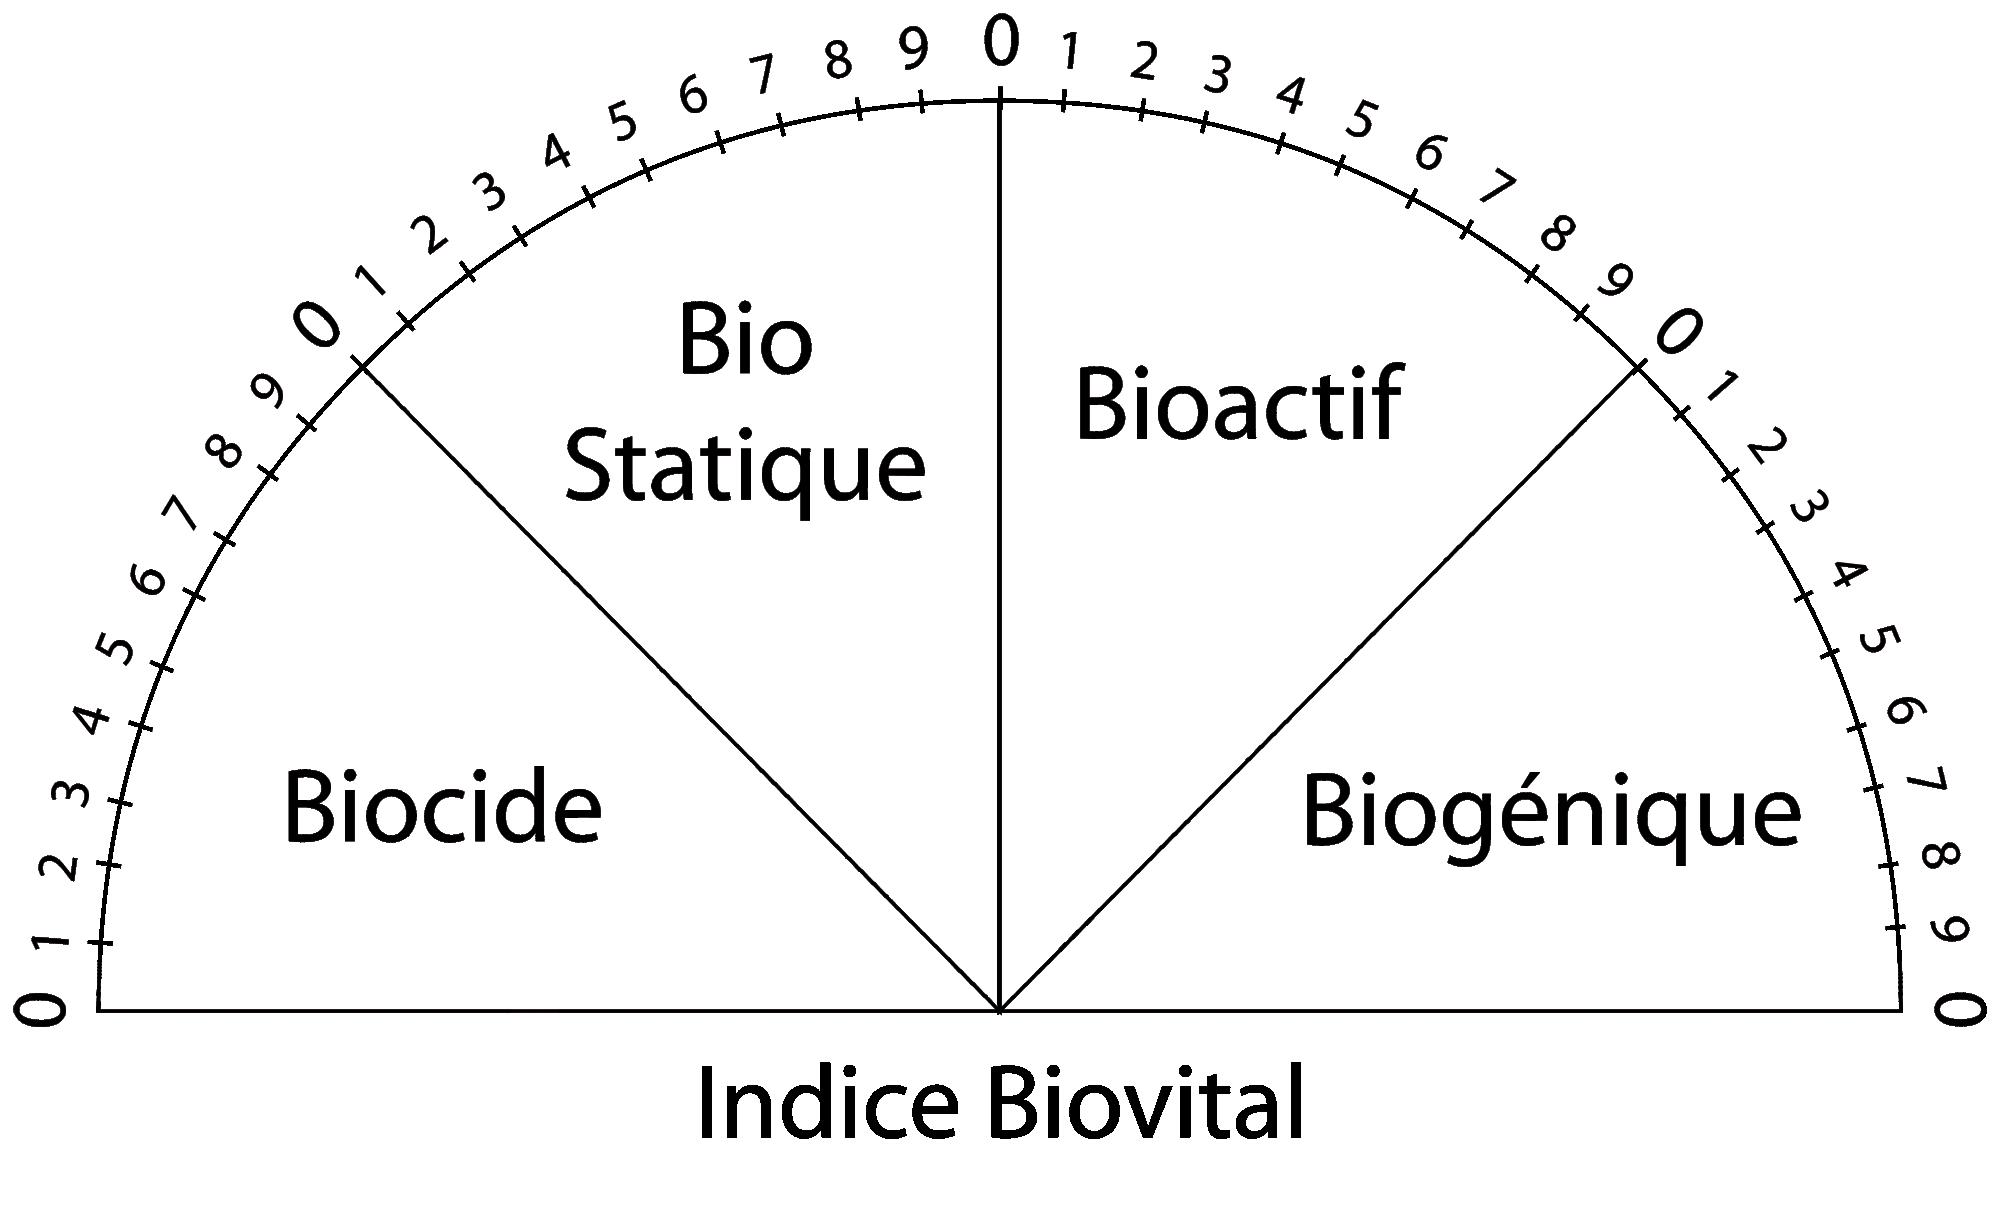 Indice-Biovital